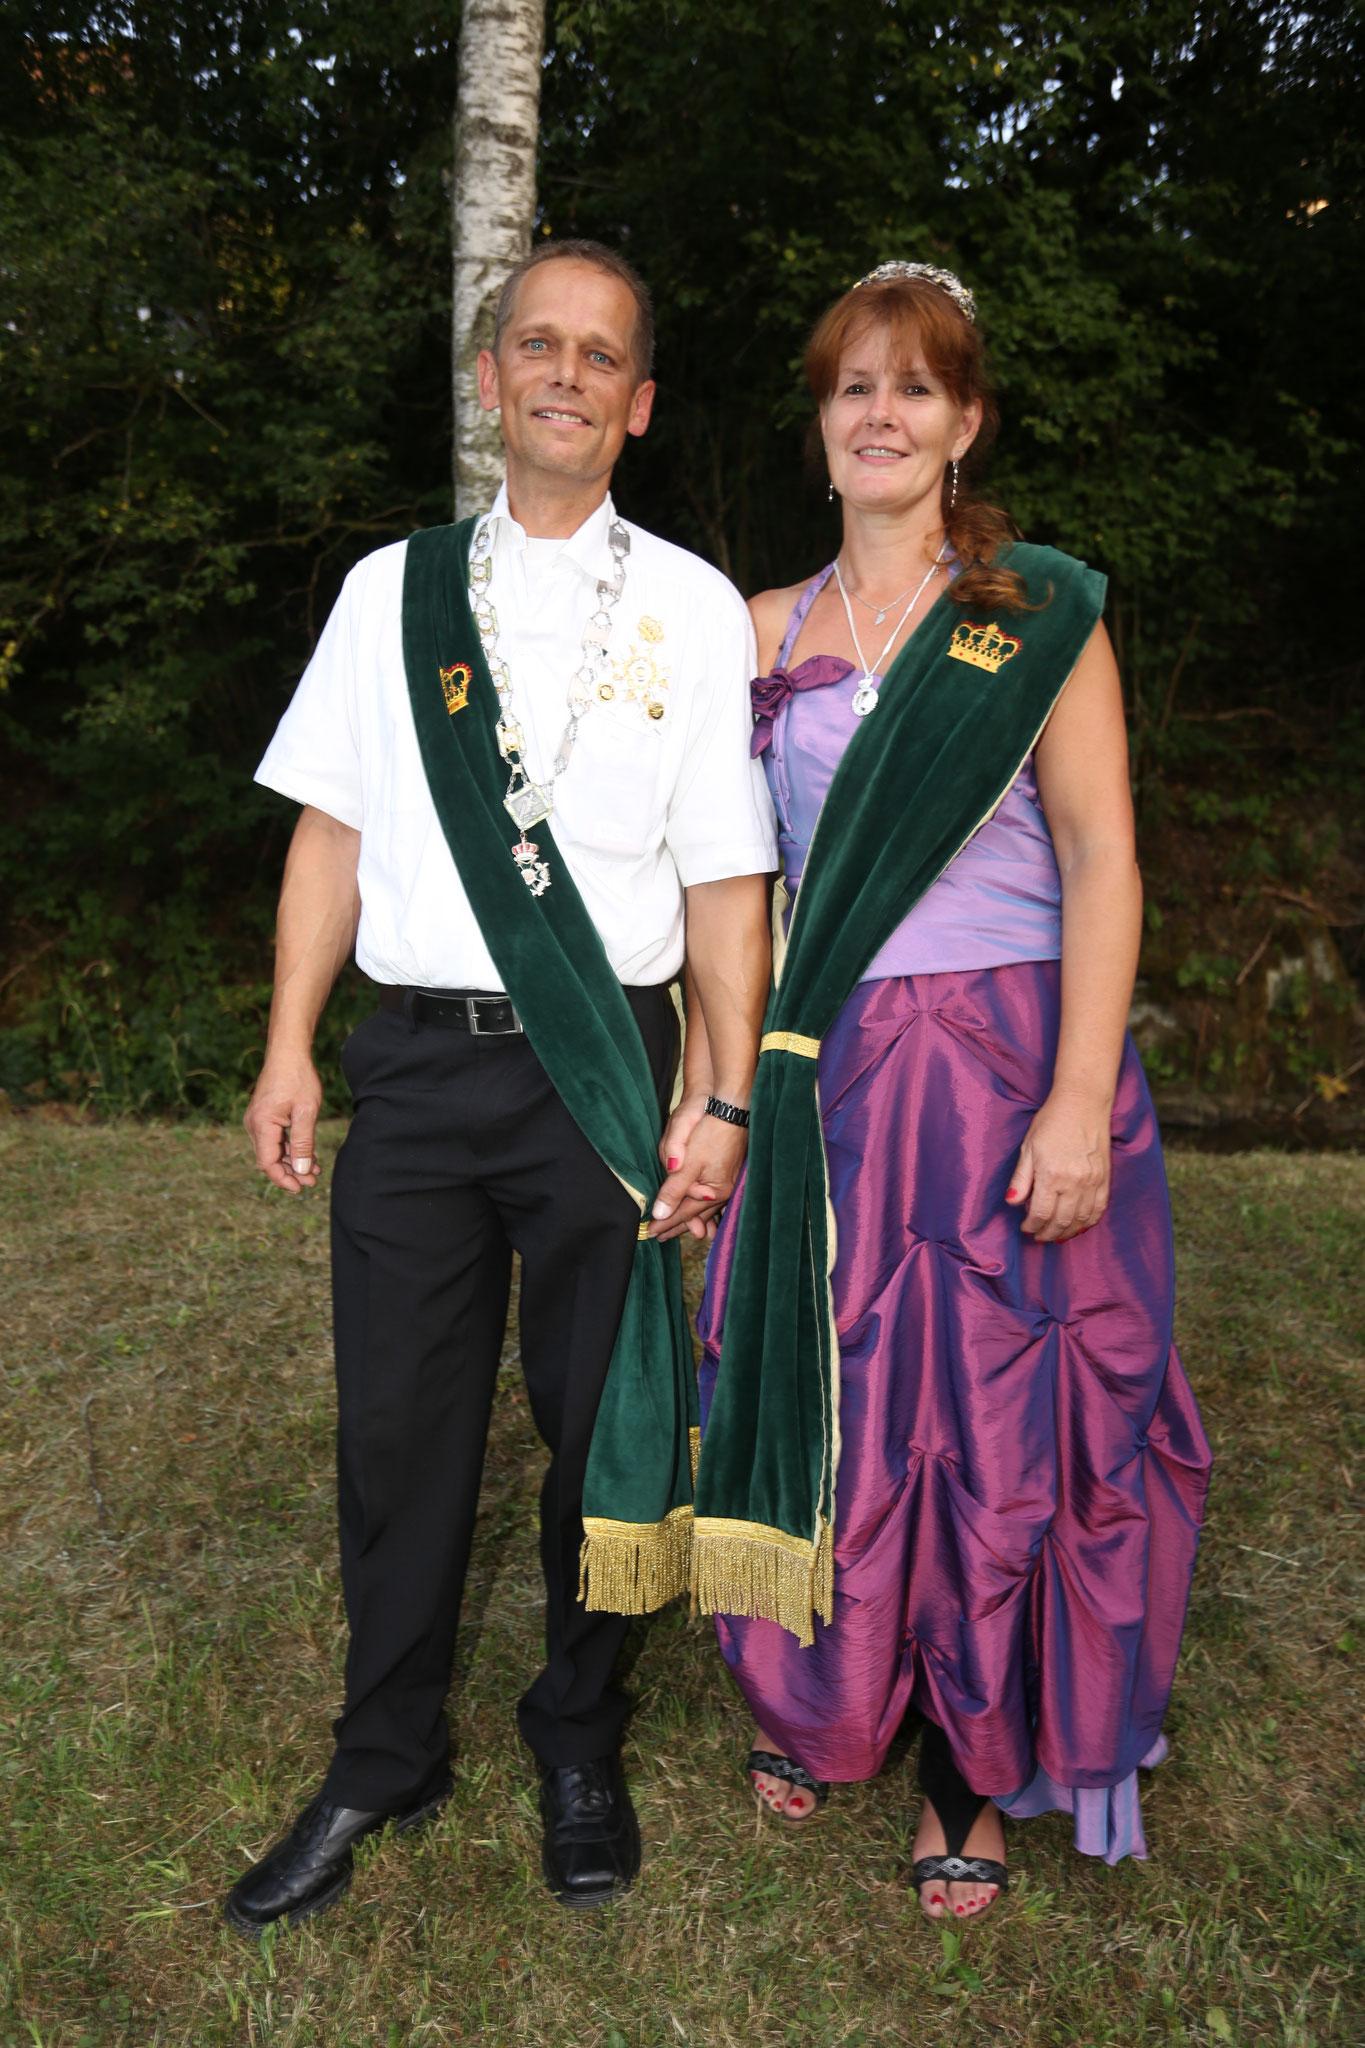 Schützenkönigspaar 2018: Volker Schmidt und Maria Schmitz